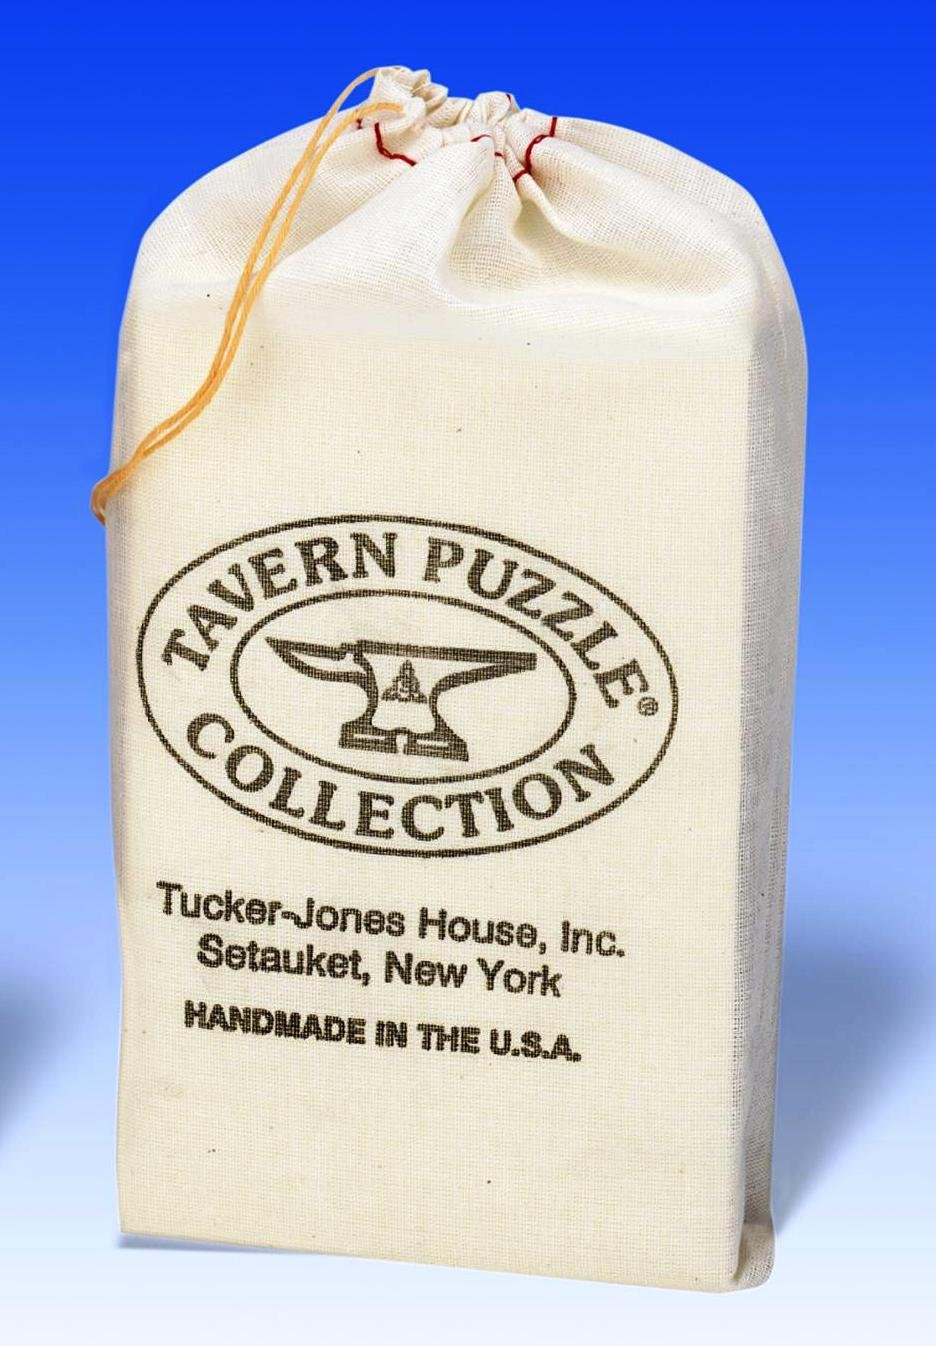 LYONS LOOPS Tavern Puzzle Tucker-Jones House Inc SG/_B000VQB2HS/_US